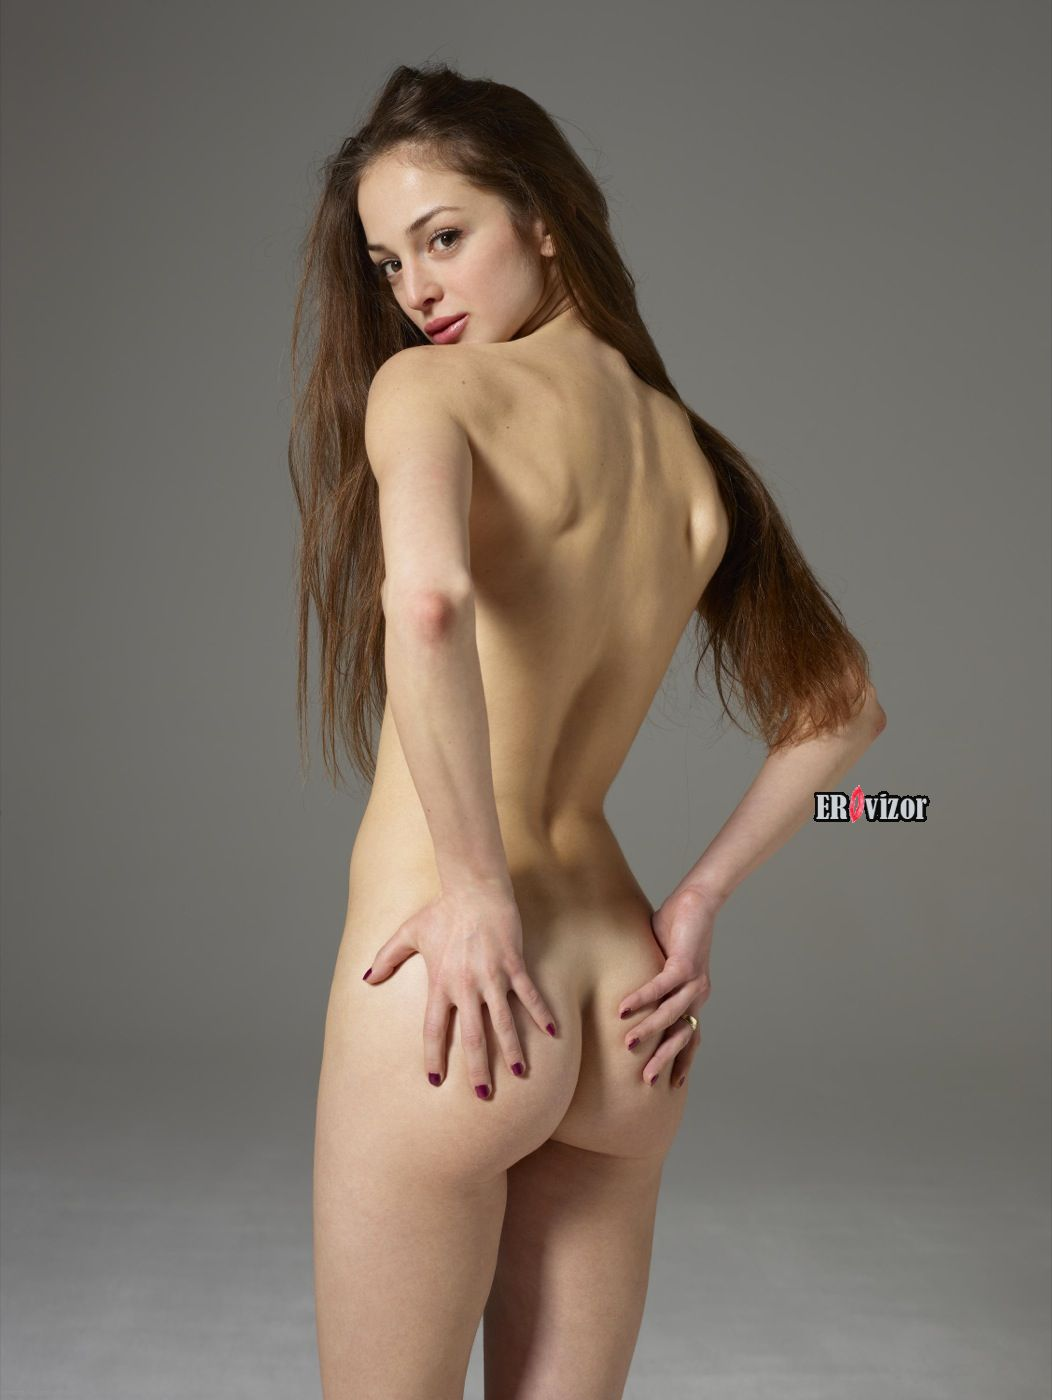 mirabell_erovizor_photo (4)